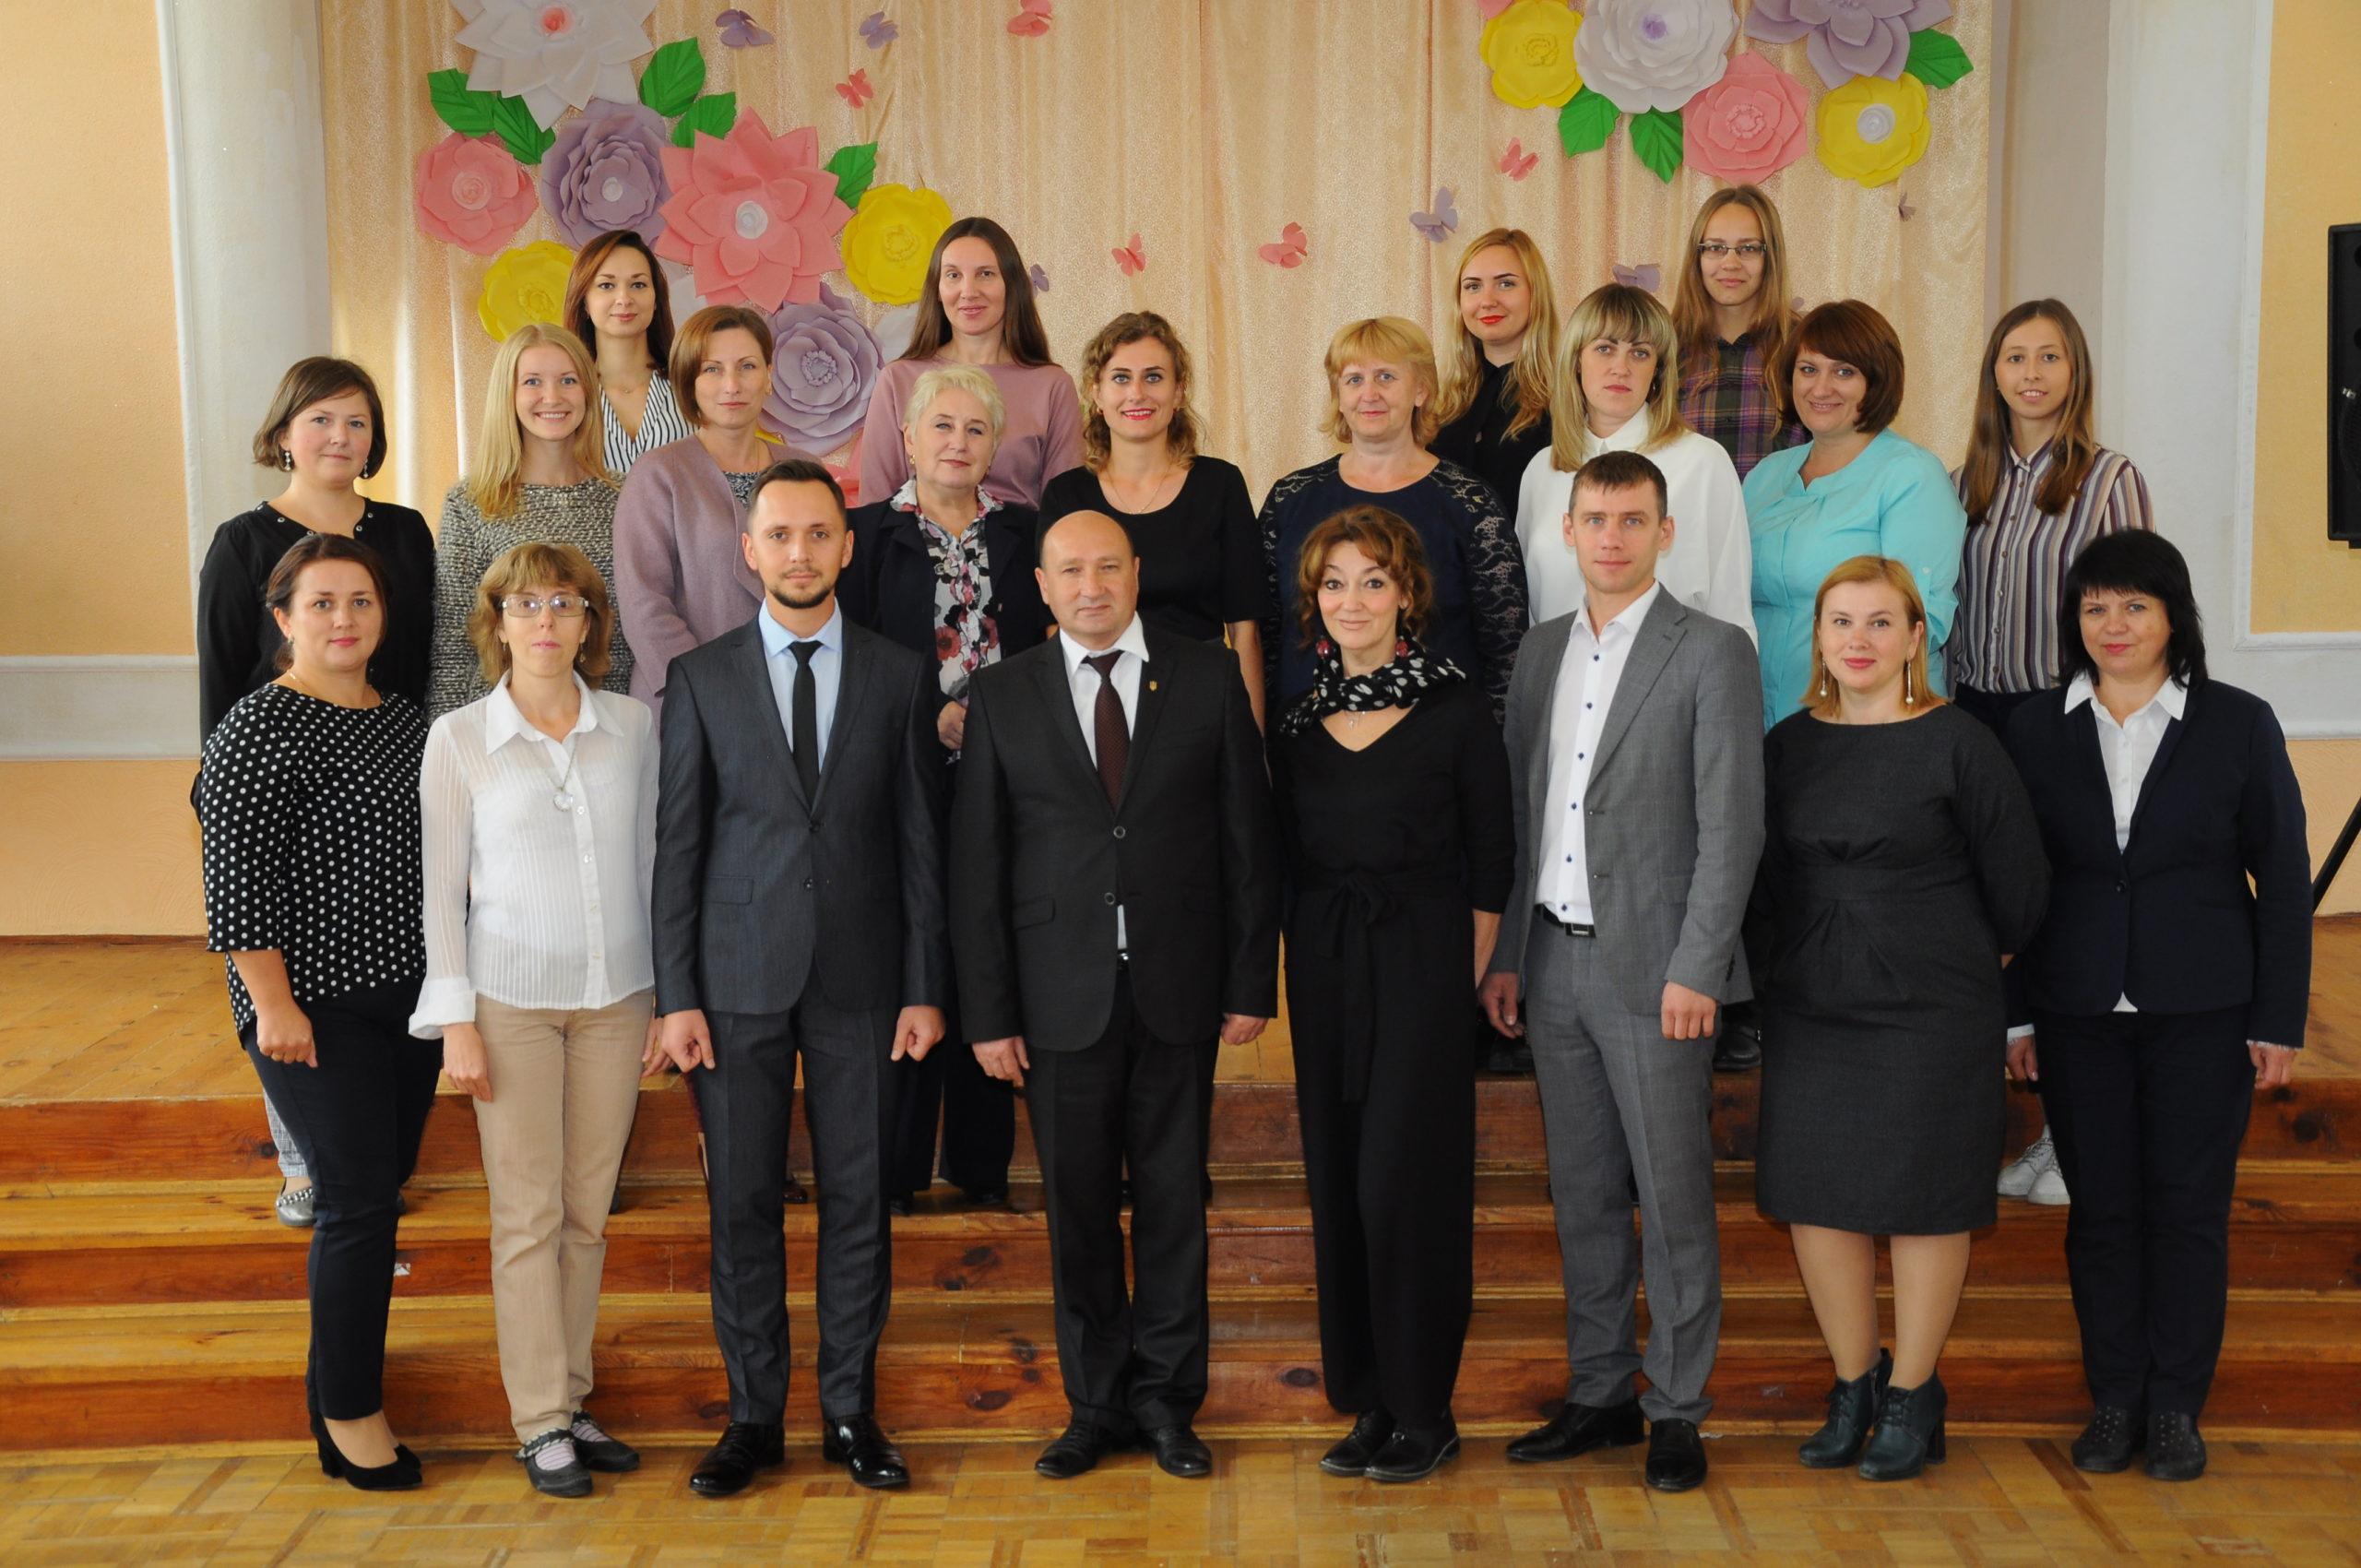 вчителі 5 школа Луцьк